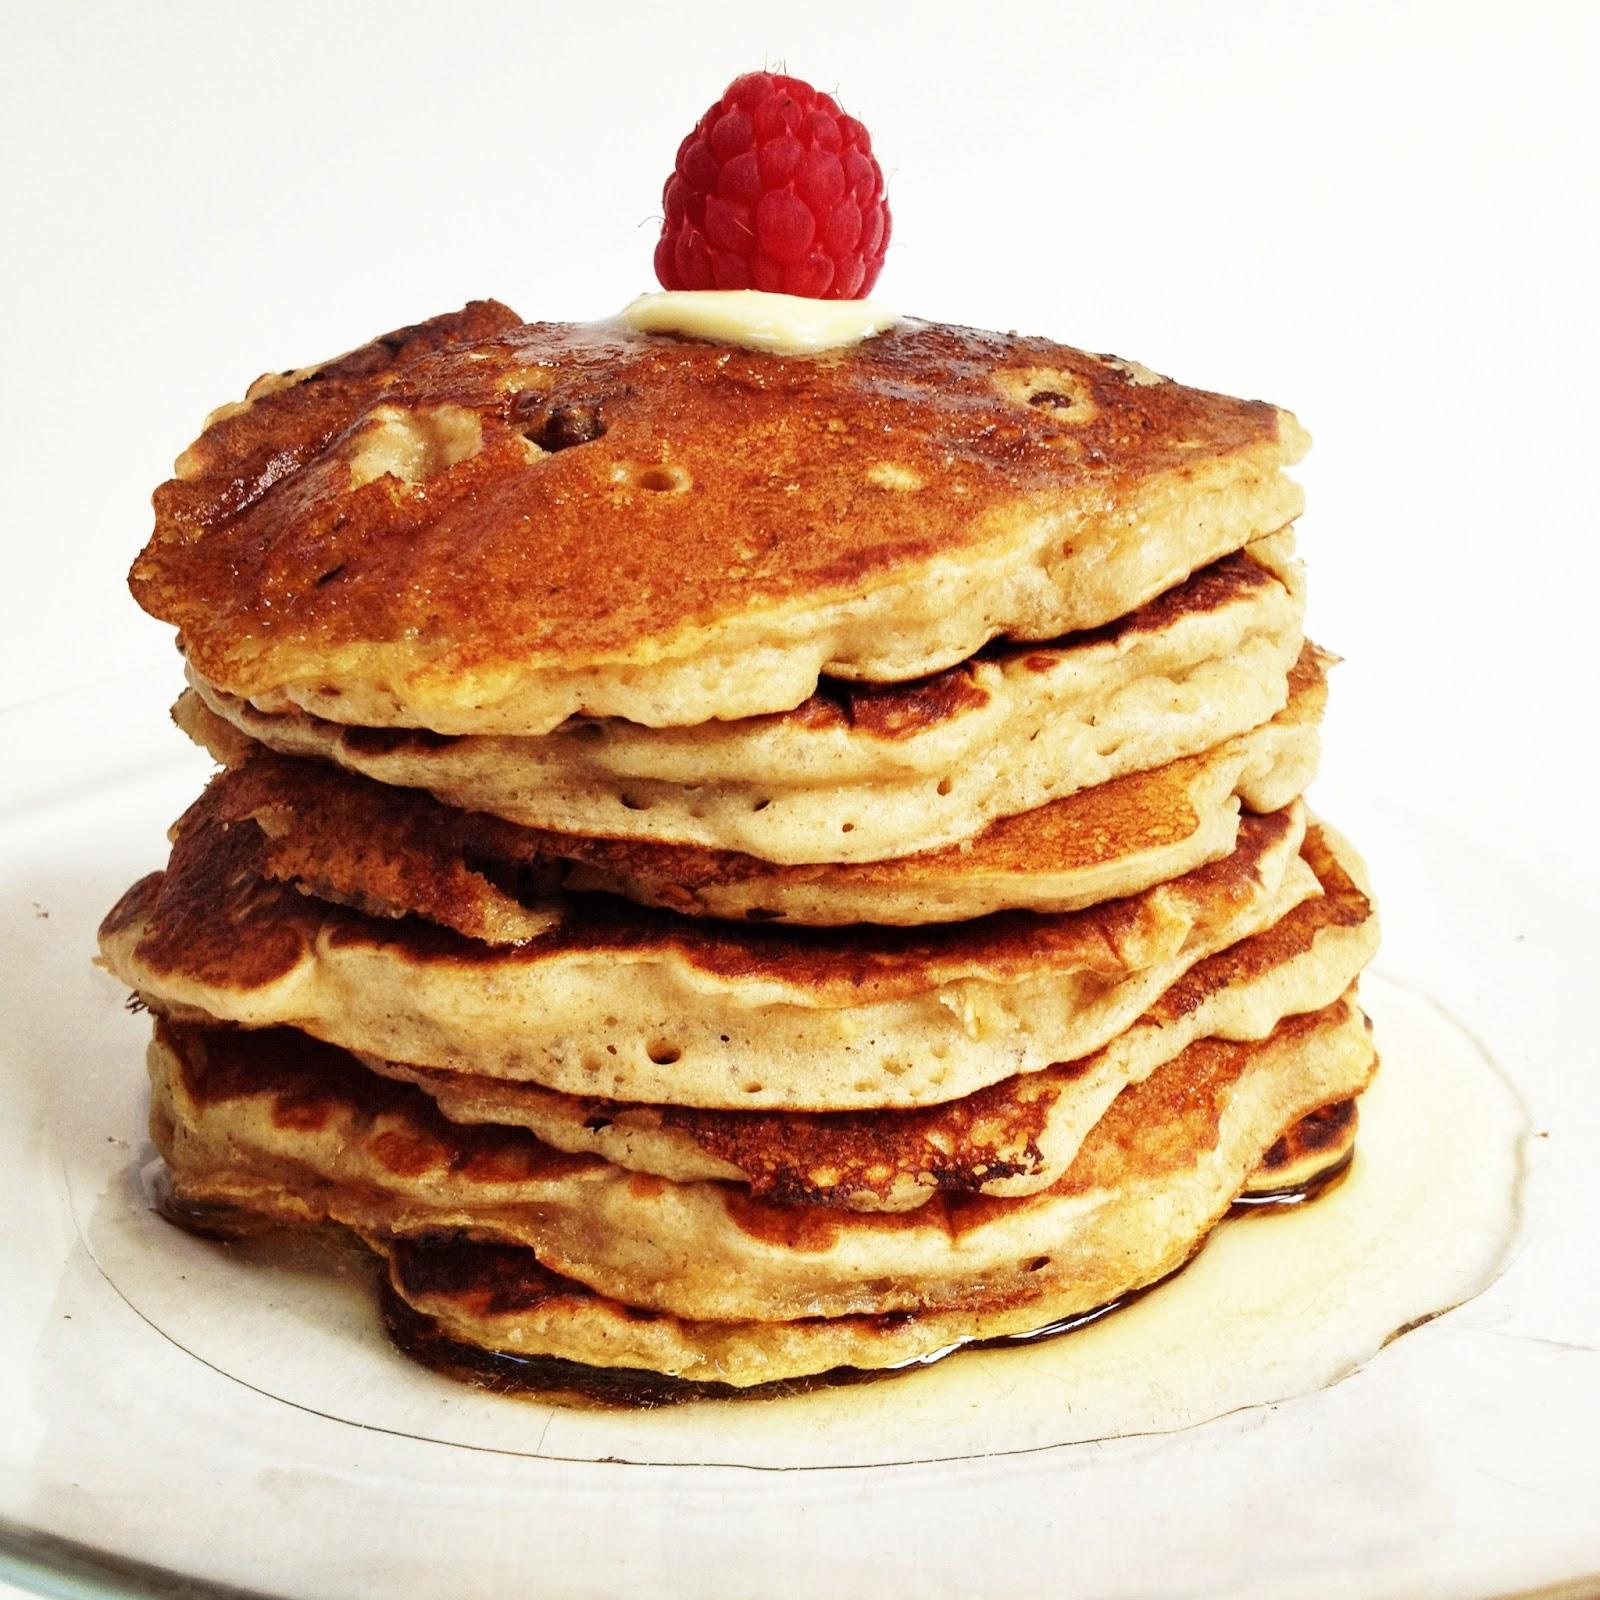 Edinburgh Eats: Oatmeal Cookie Pancakes